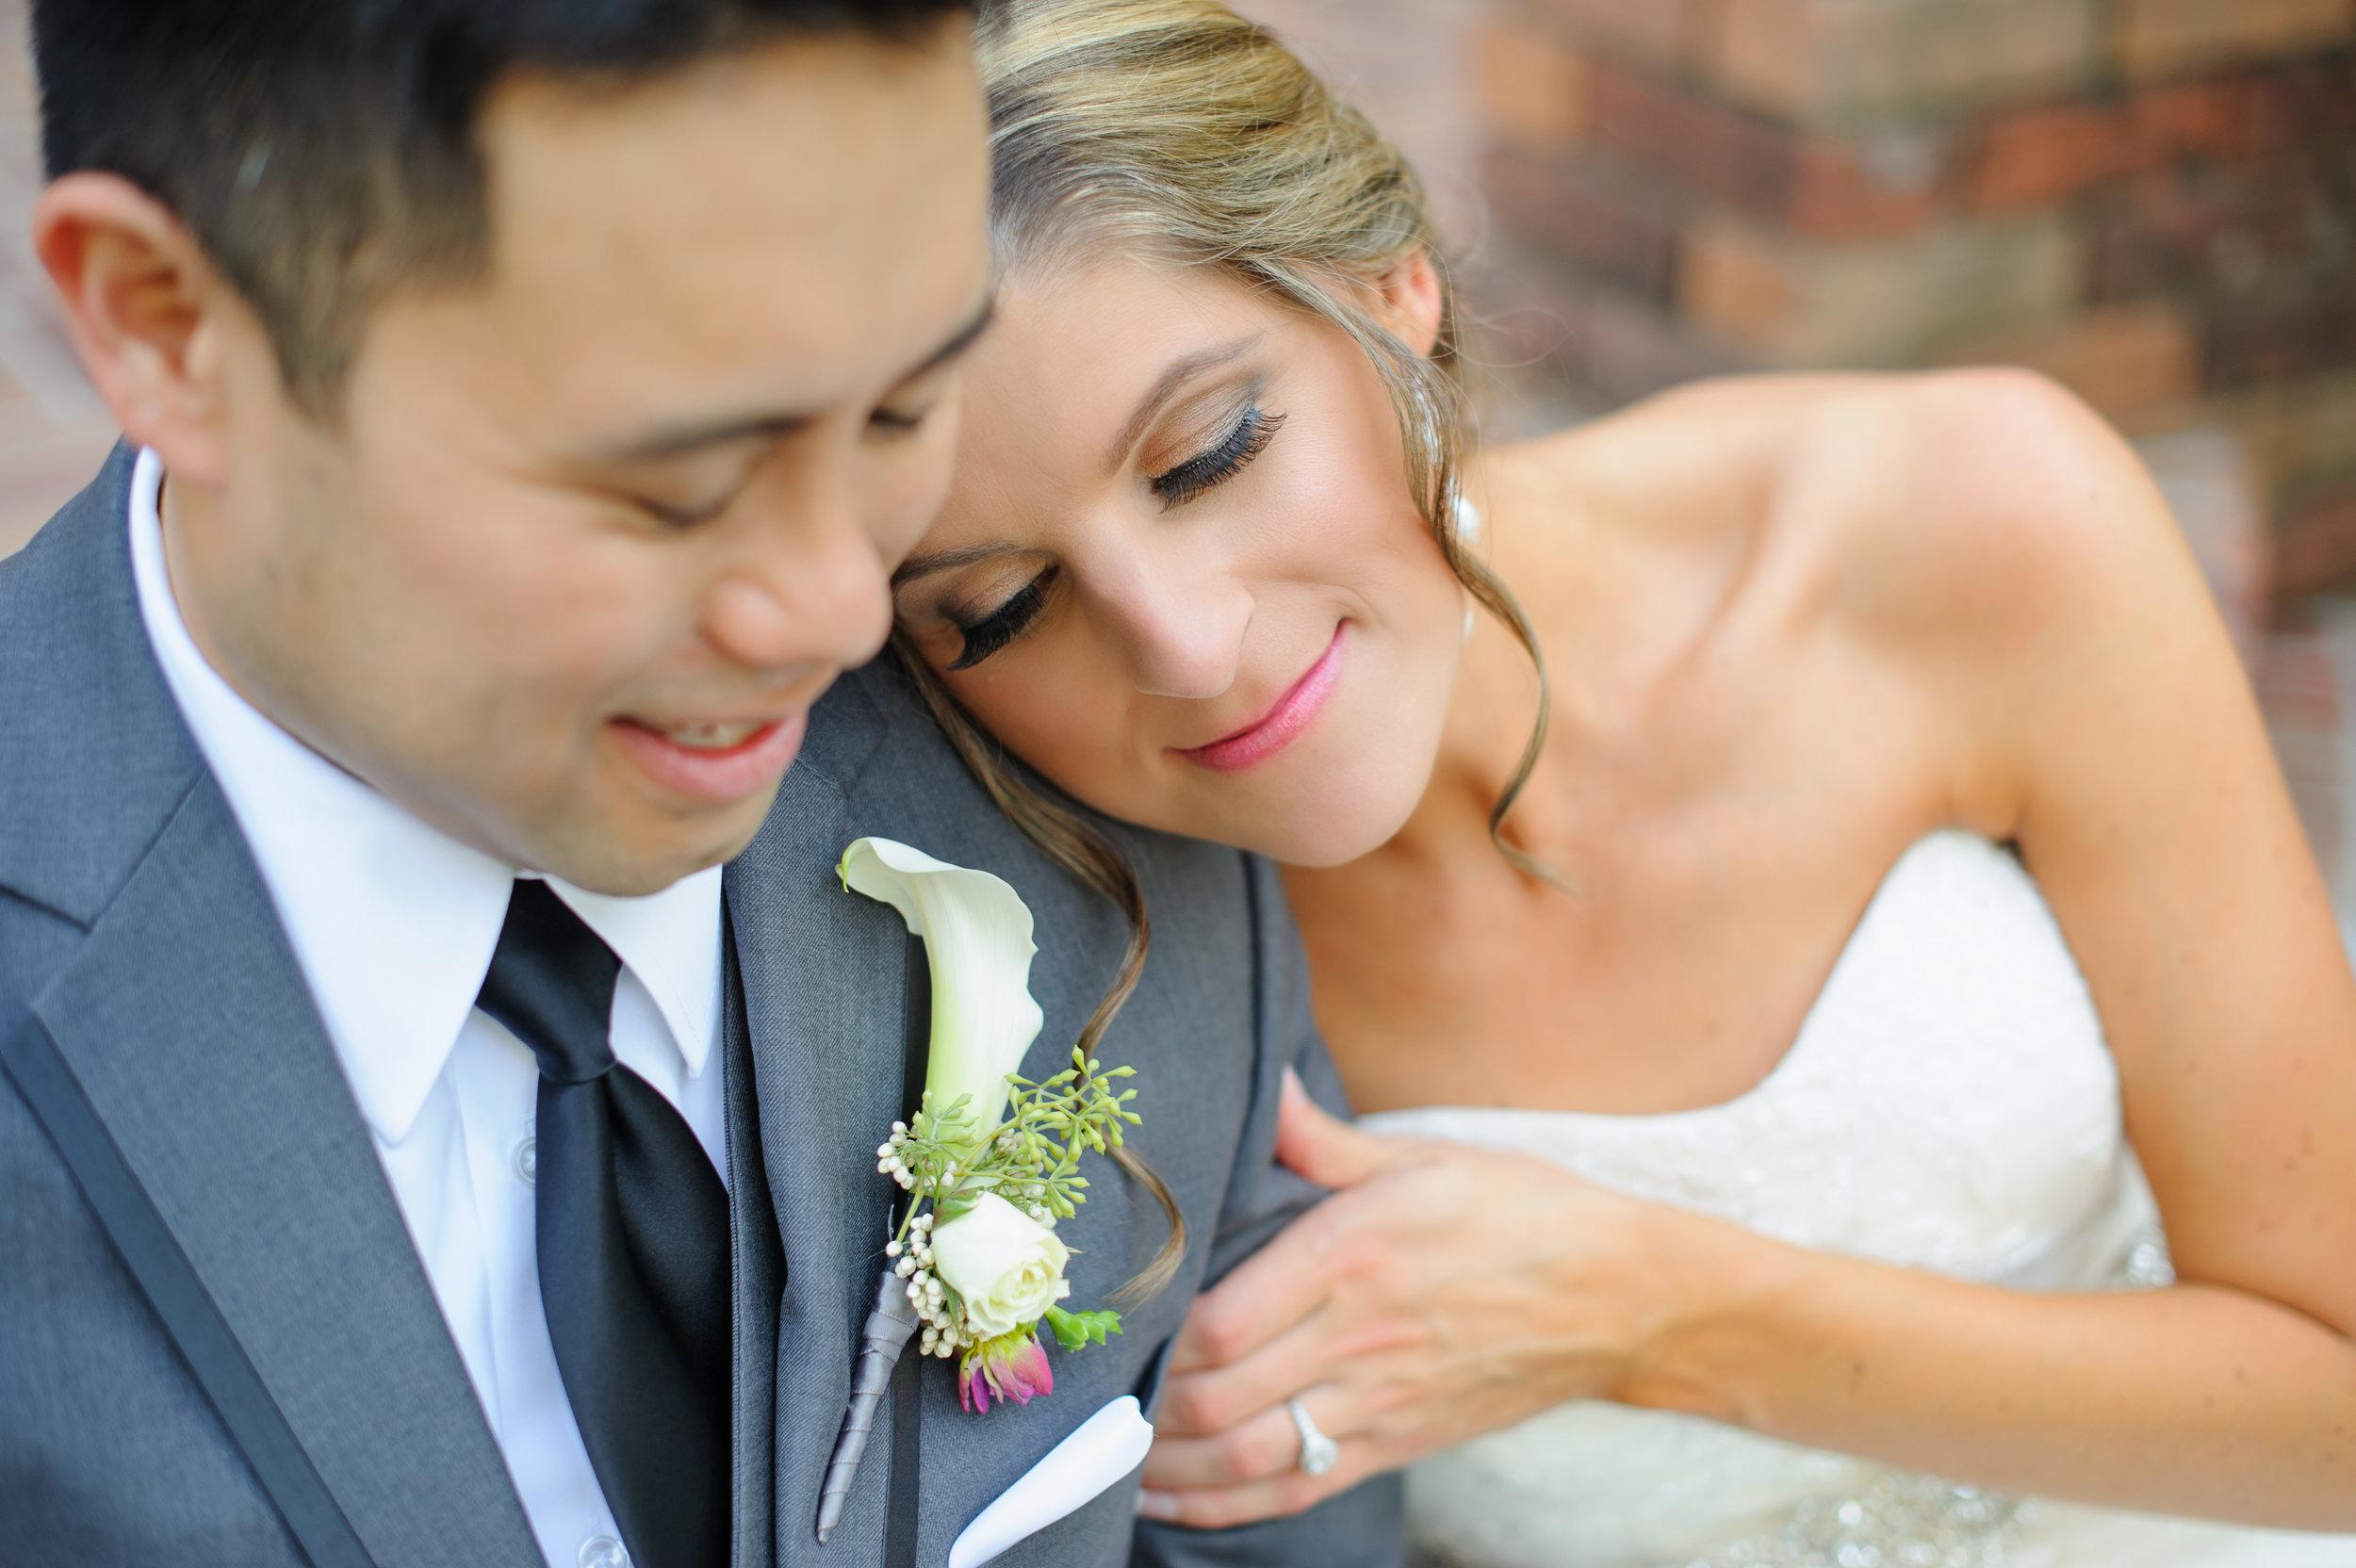 susan-brad-023-sacramento-wedding-photographer-katherine-nicole-photography.JPG